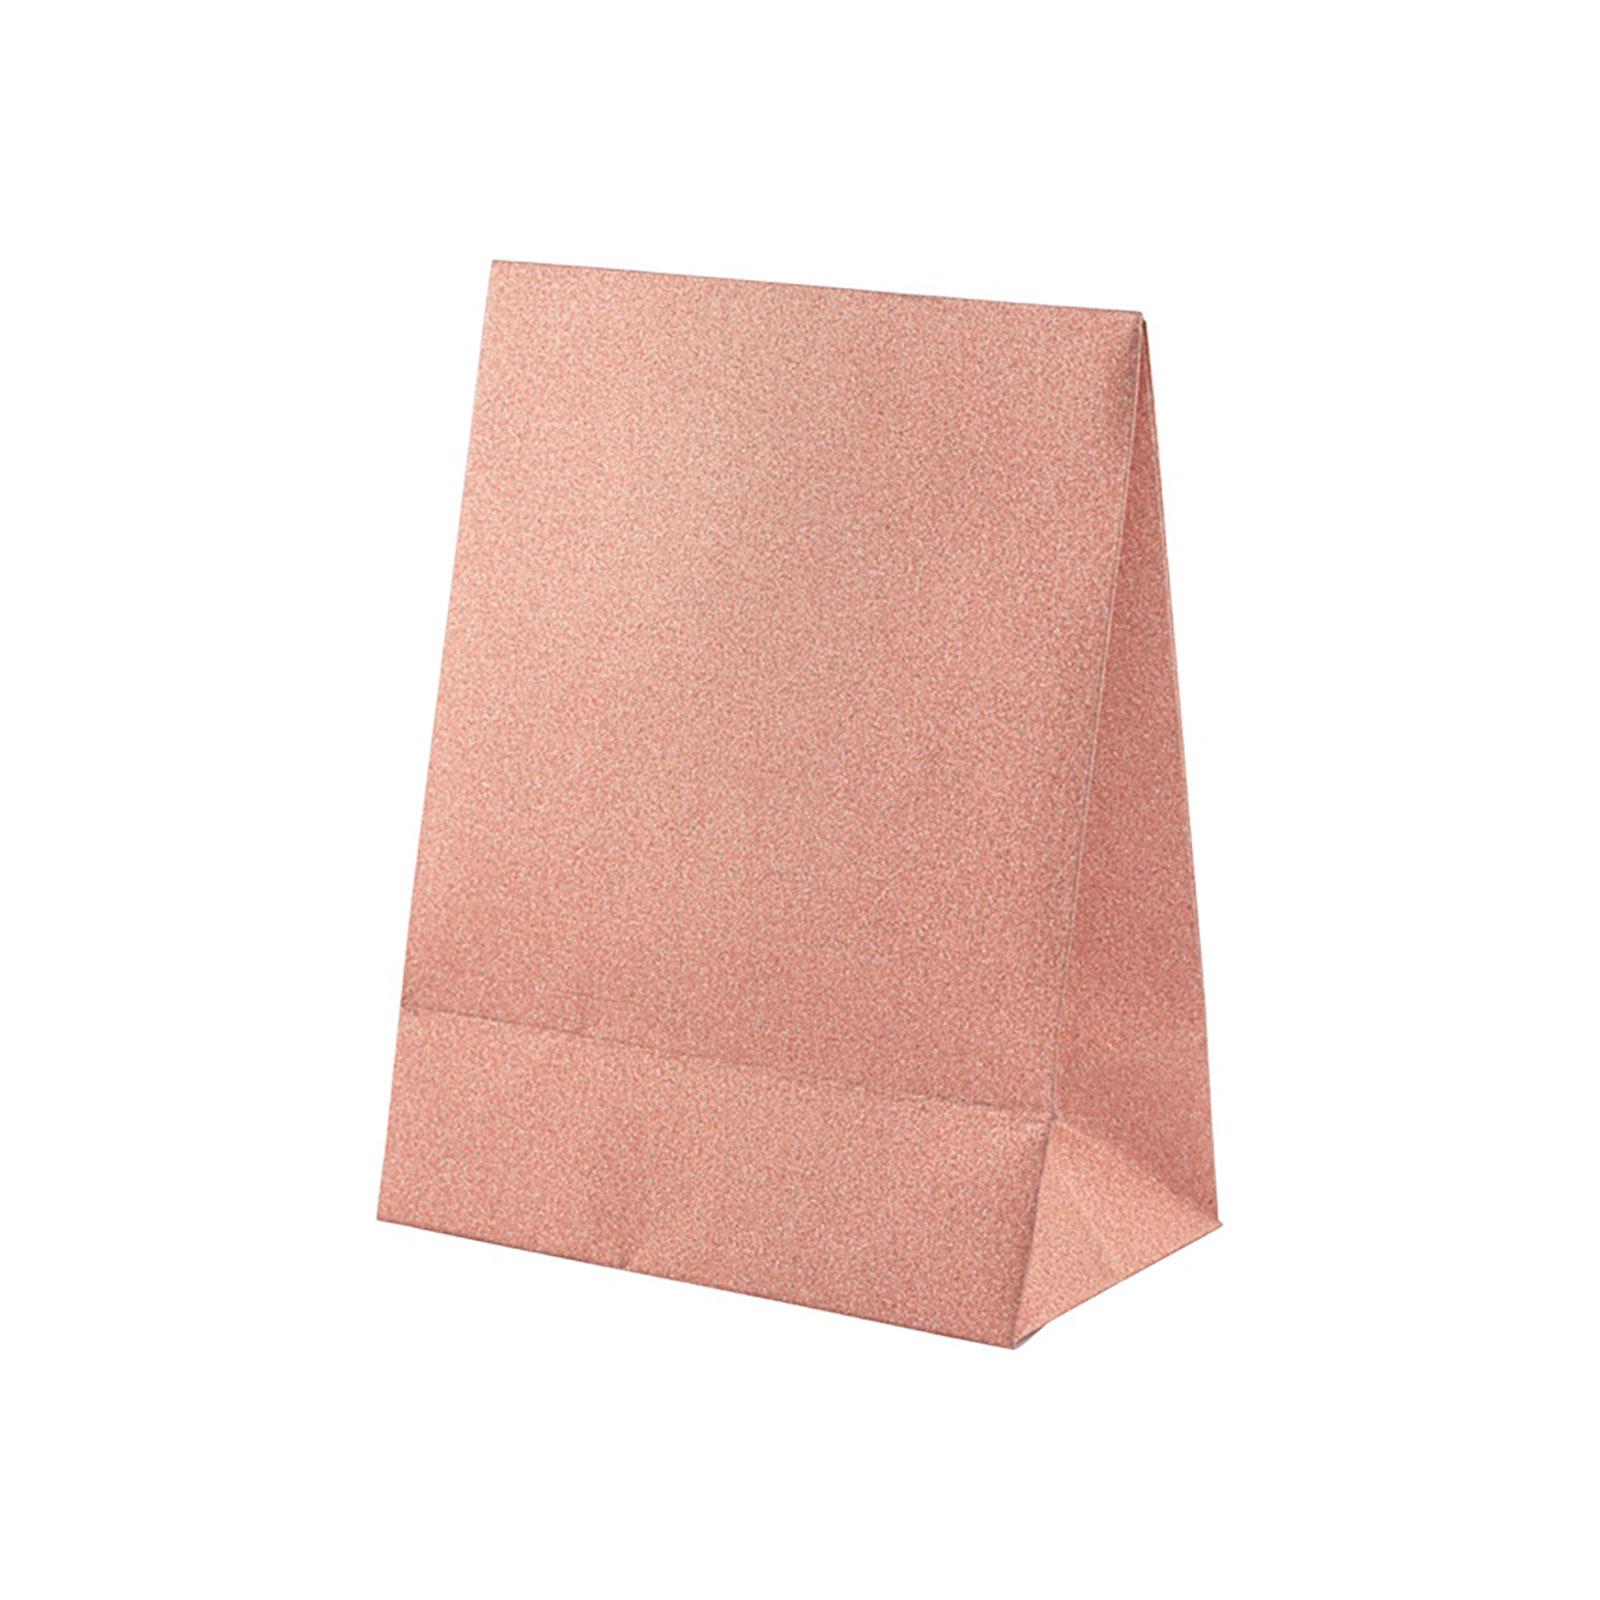 Presentpåse rosa glitter - 17x13 cm